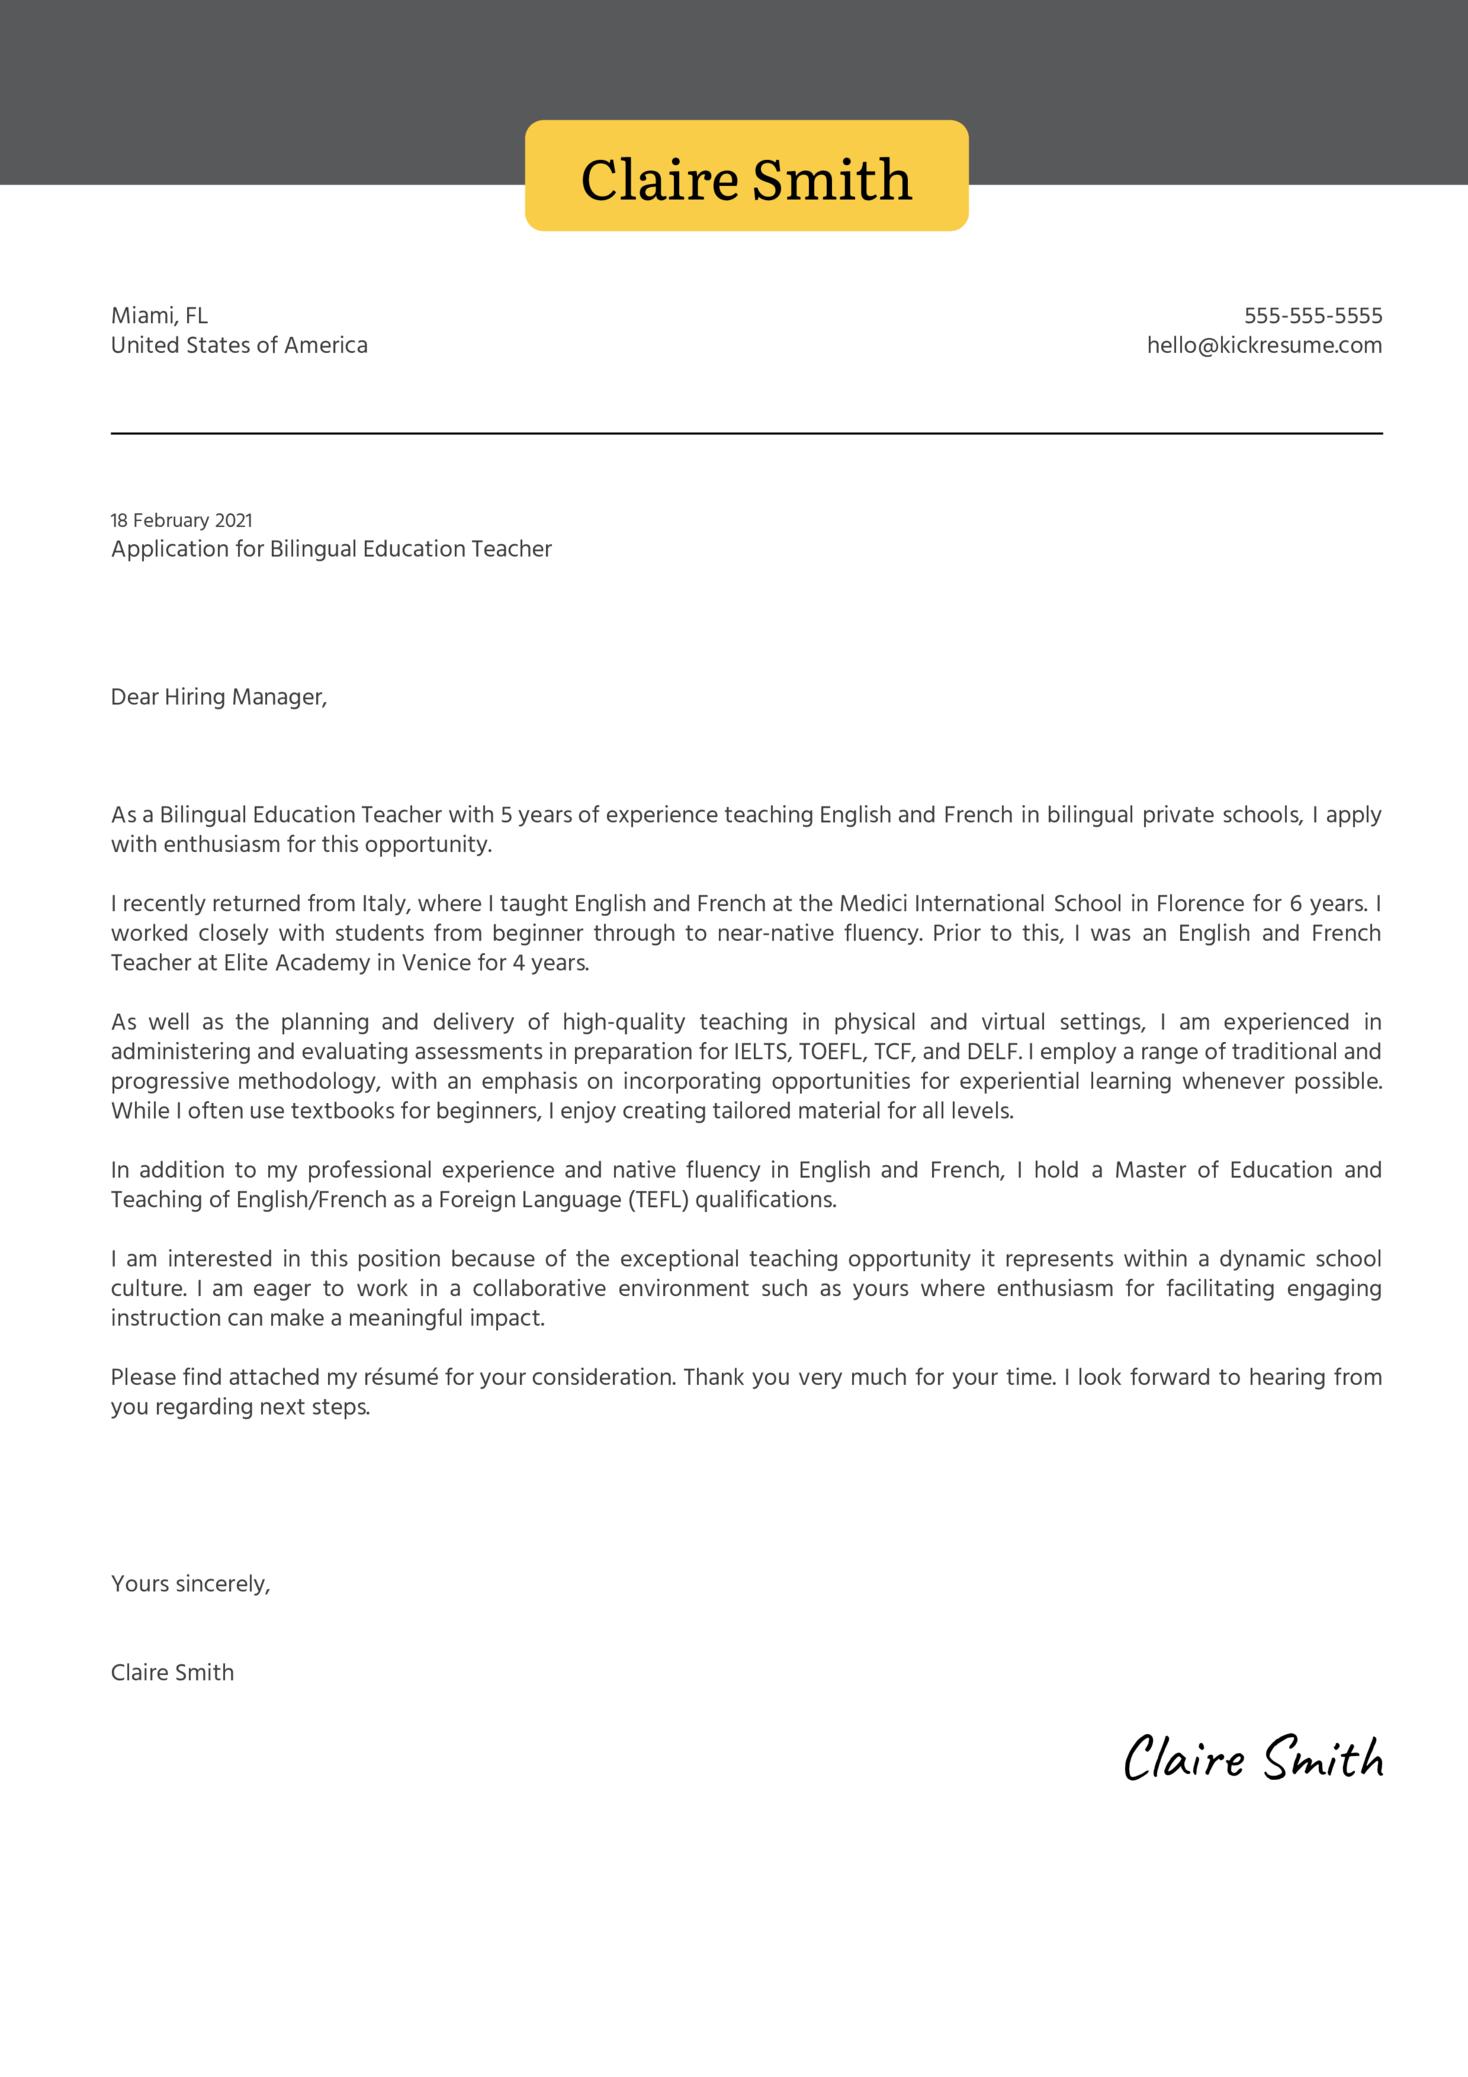 Bilingual Education Teacher Cover Letter Example   Kickresume